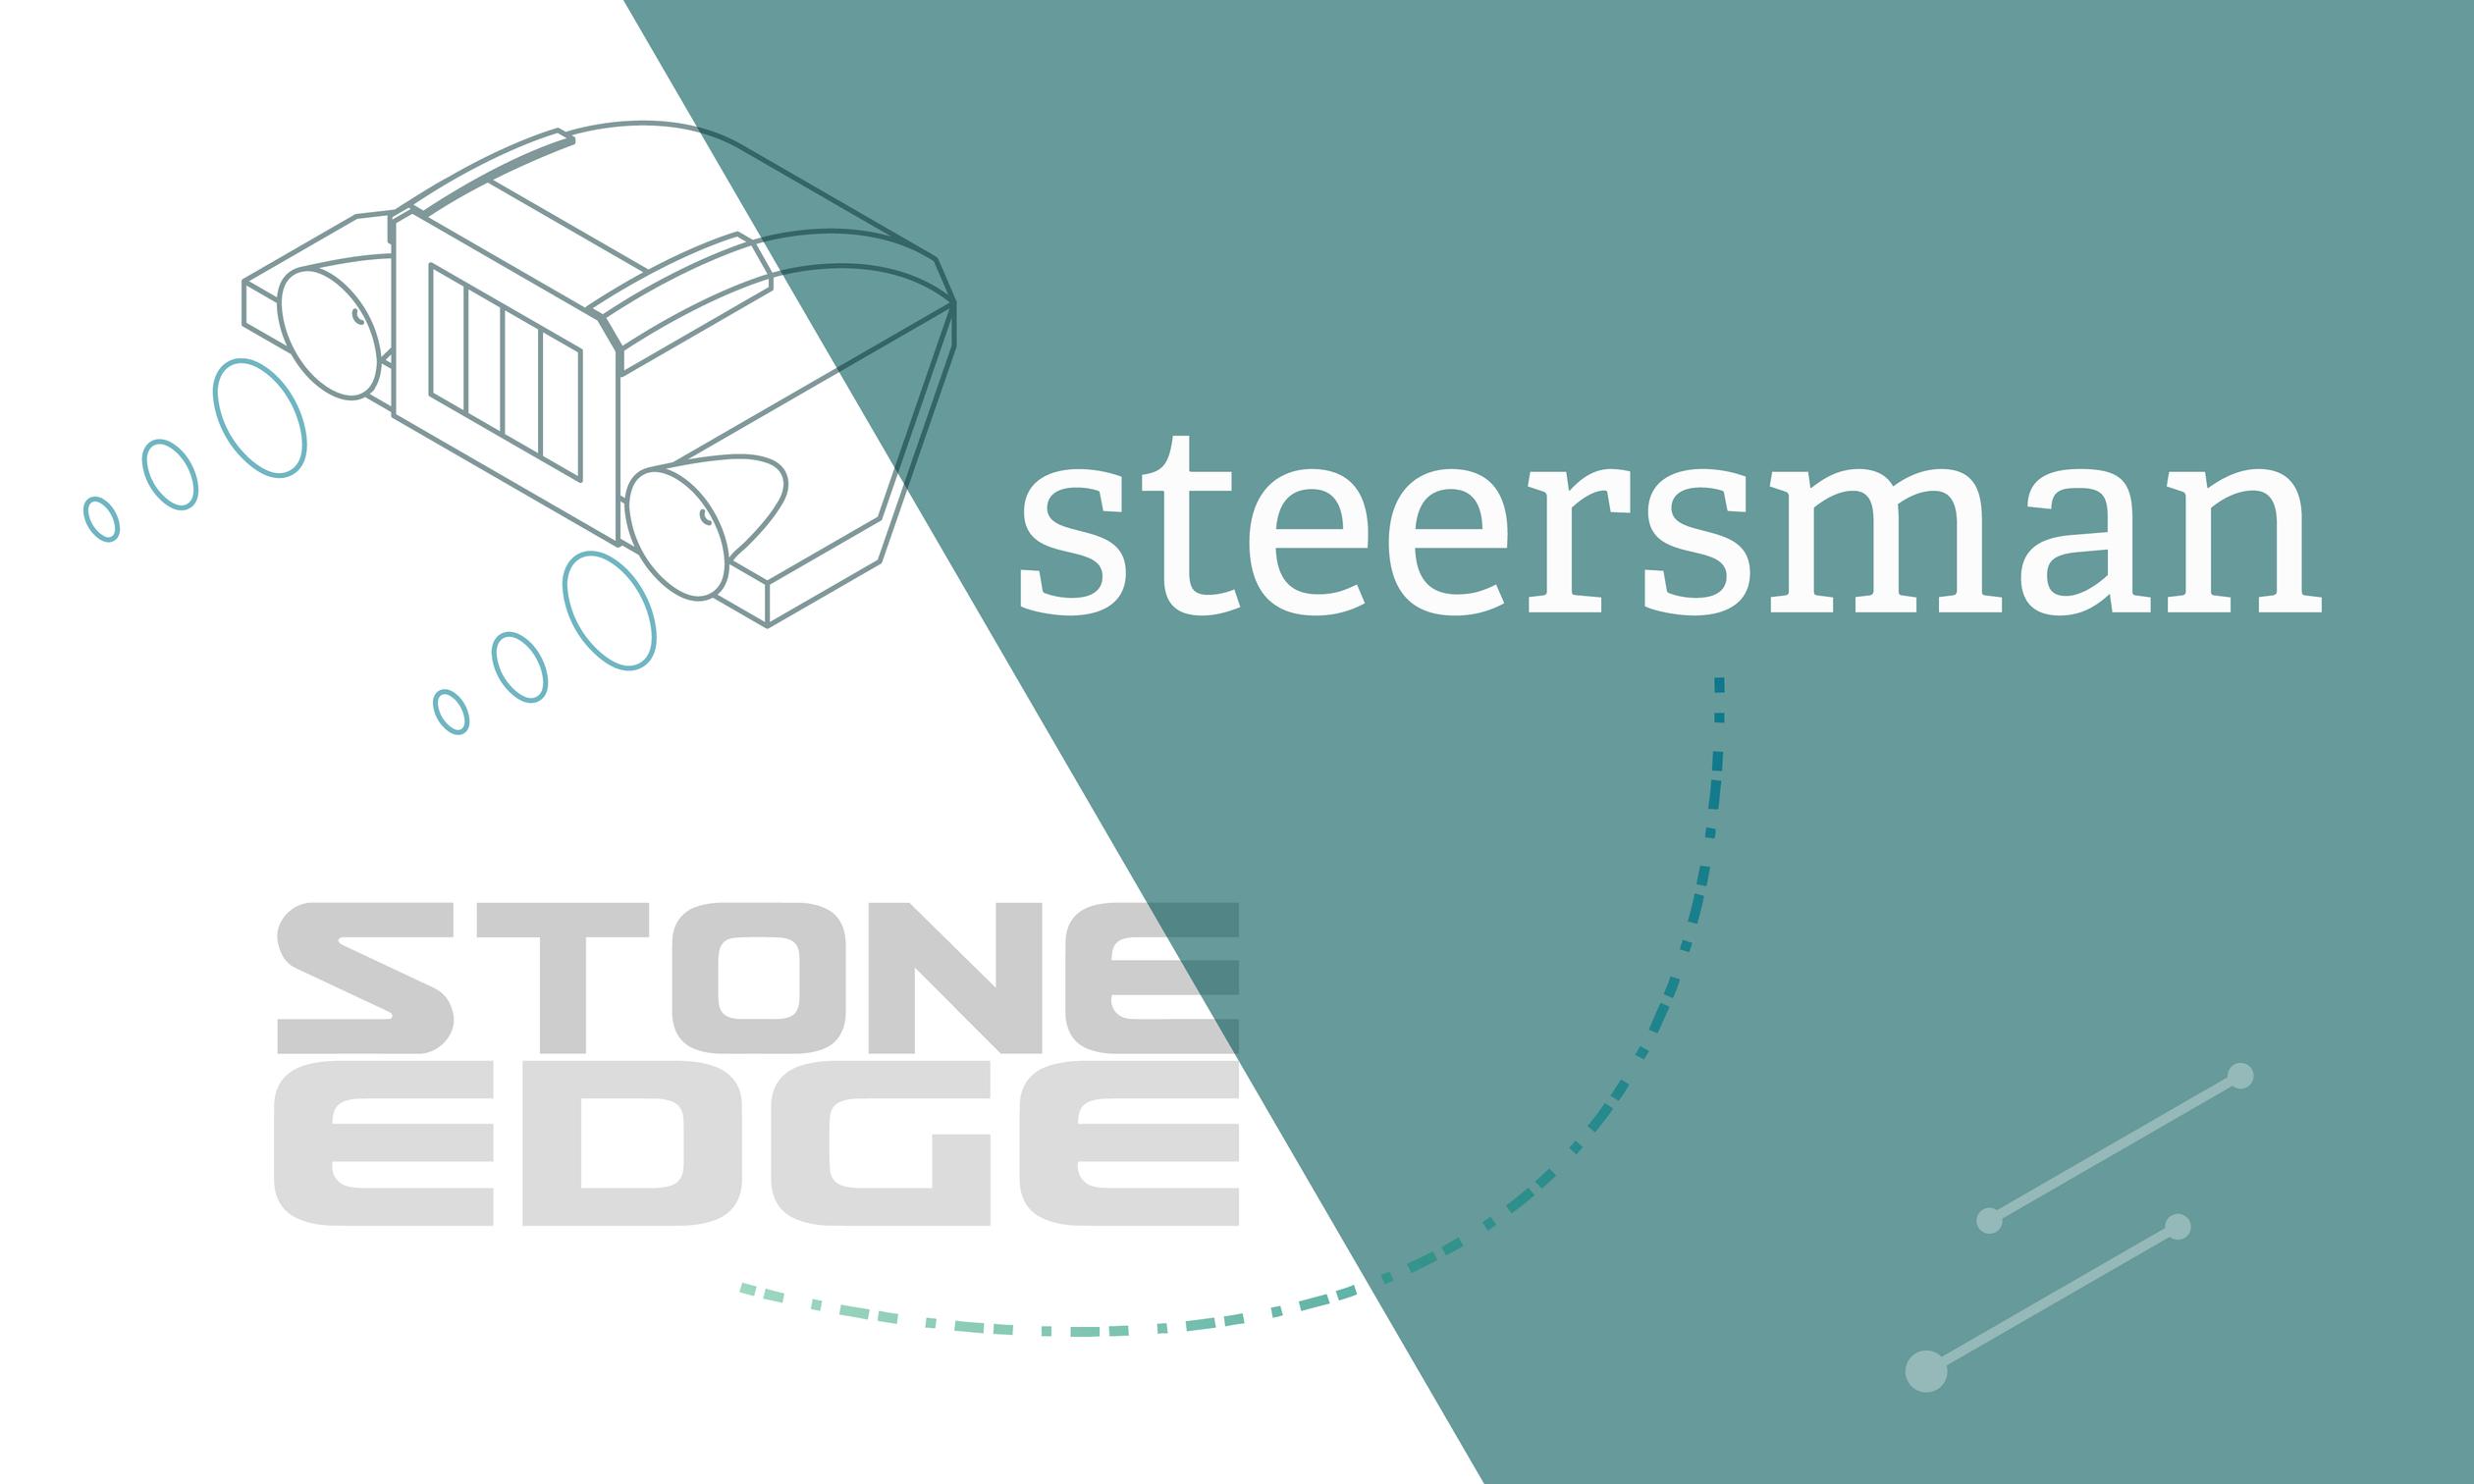 stone edge steersman migration.png